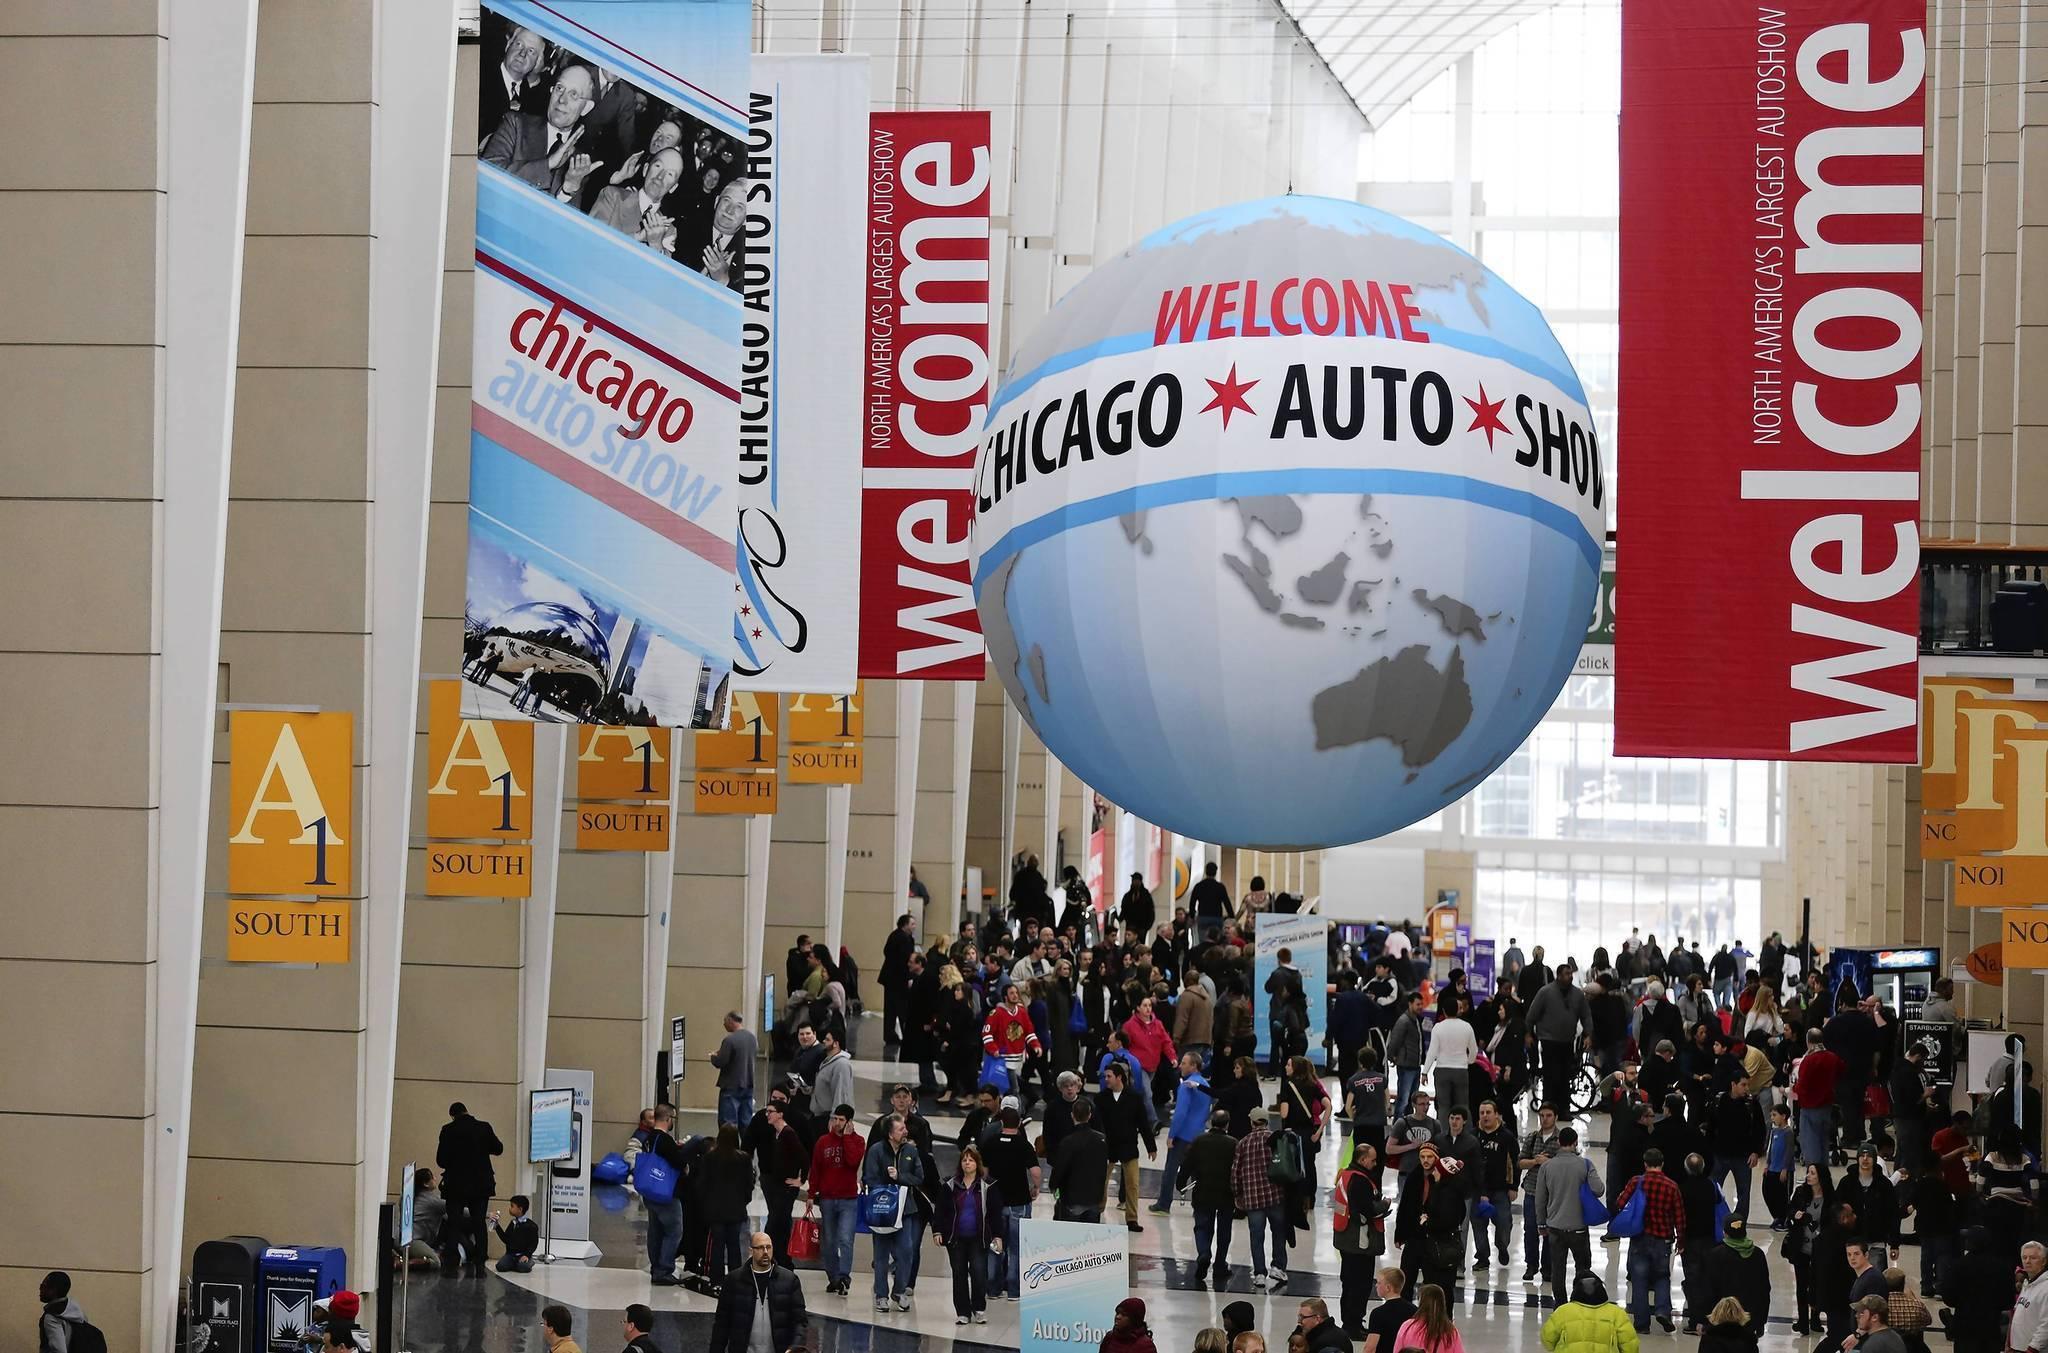 2015 Chicago Auto Show Chi-2015-chicago-auto-show-announced-20140722